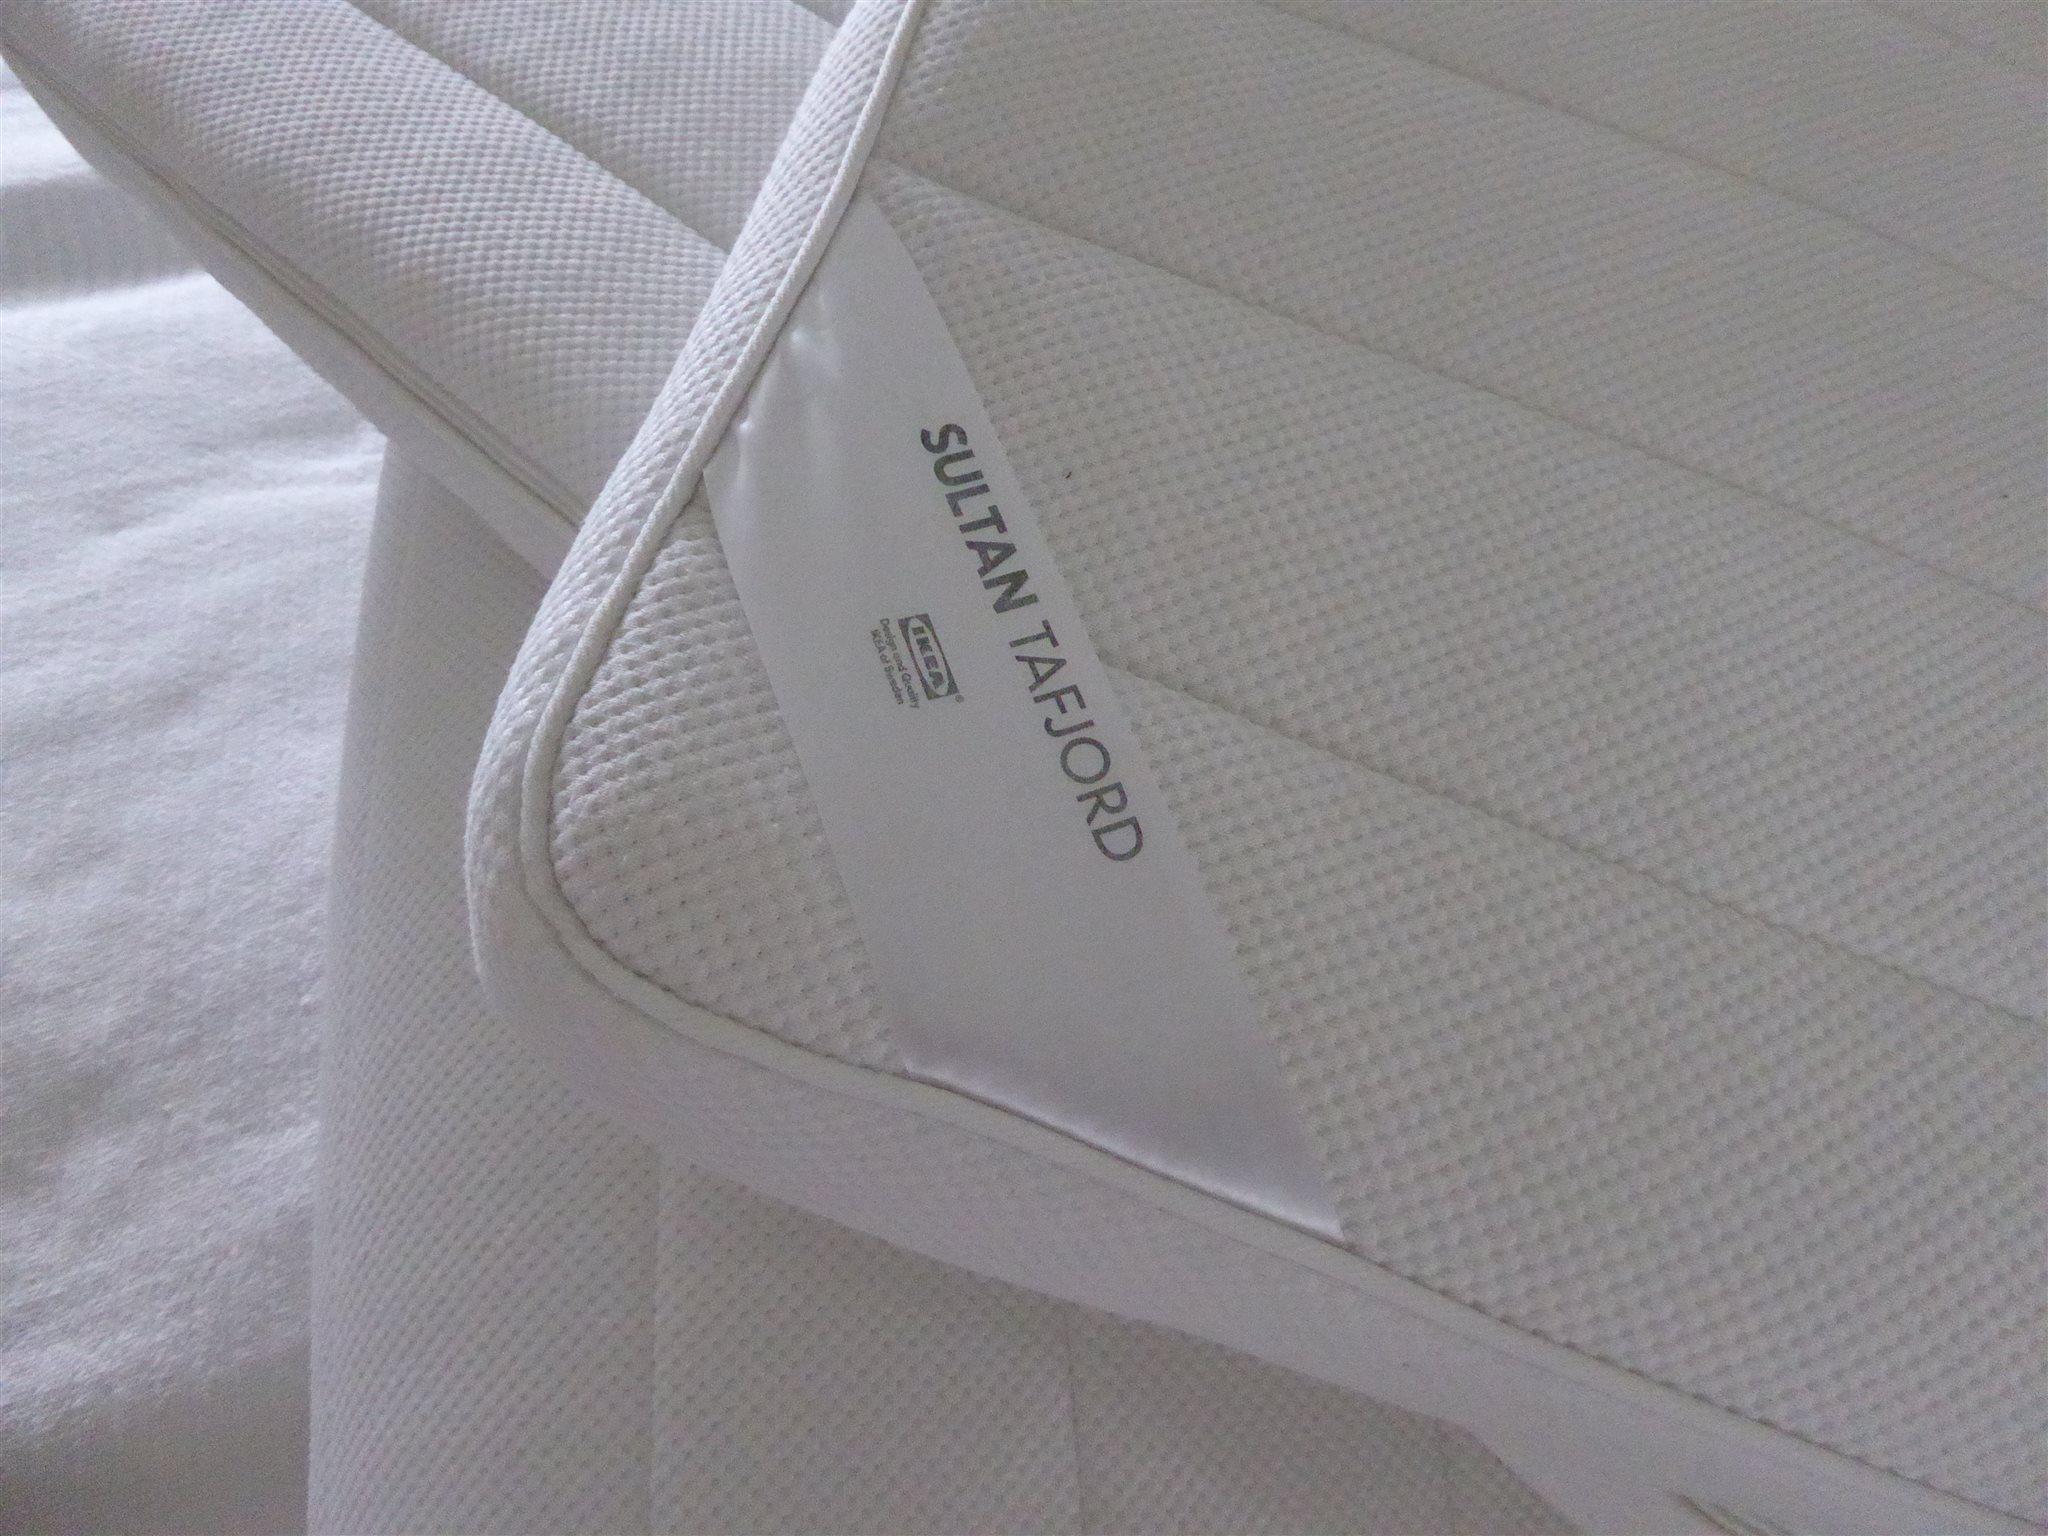 Ikea Sultan Timan Dekmatras.Bddmadrass Ikea 120 Free Beautiful Matelas Ikea Sultan Frais Les